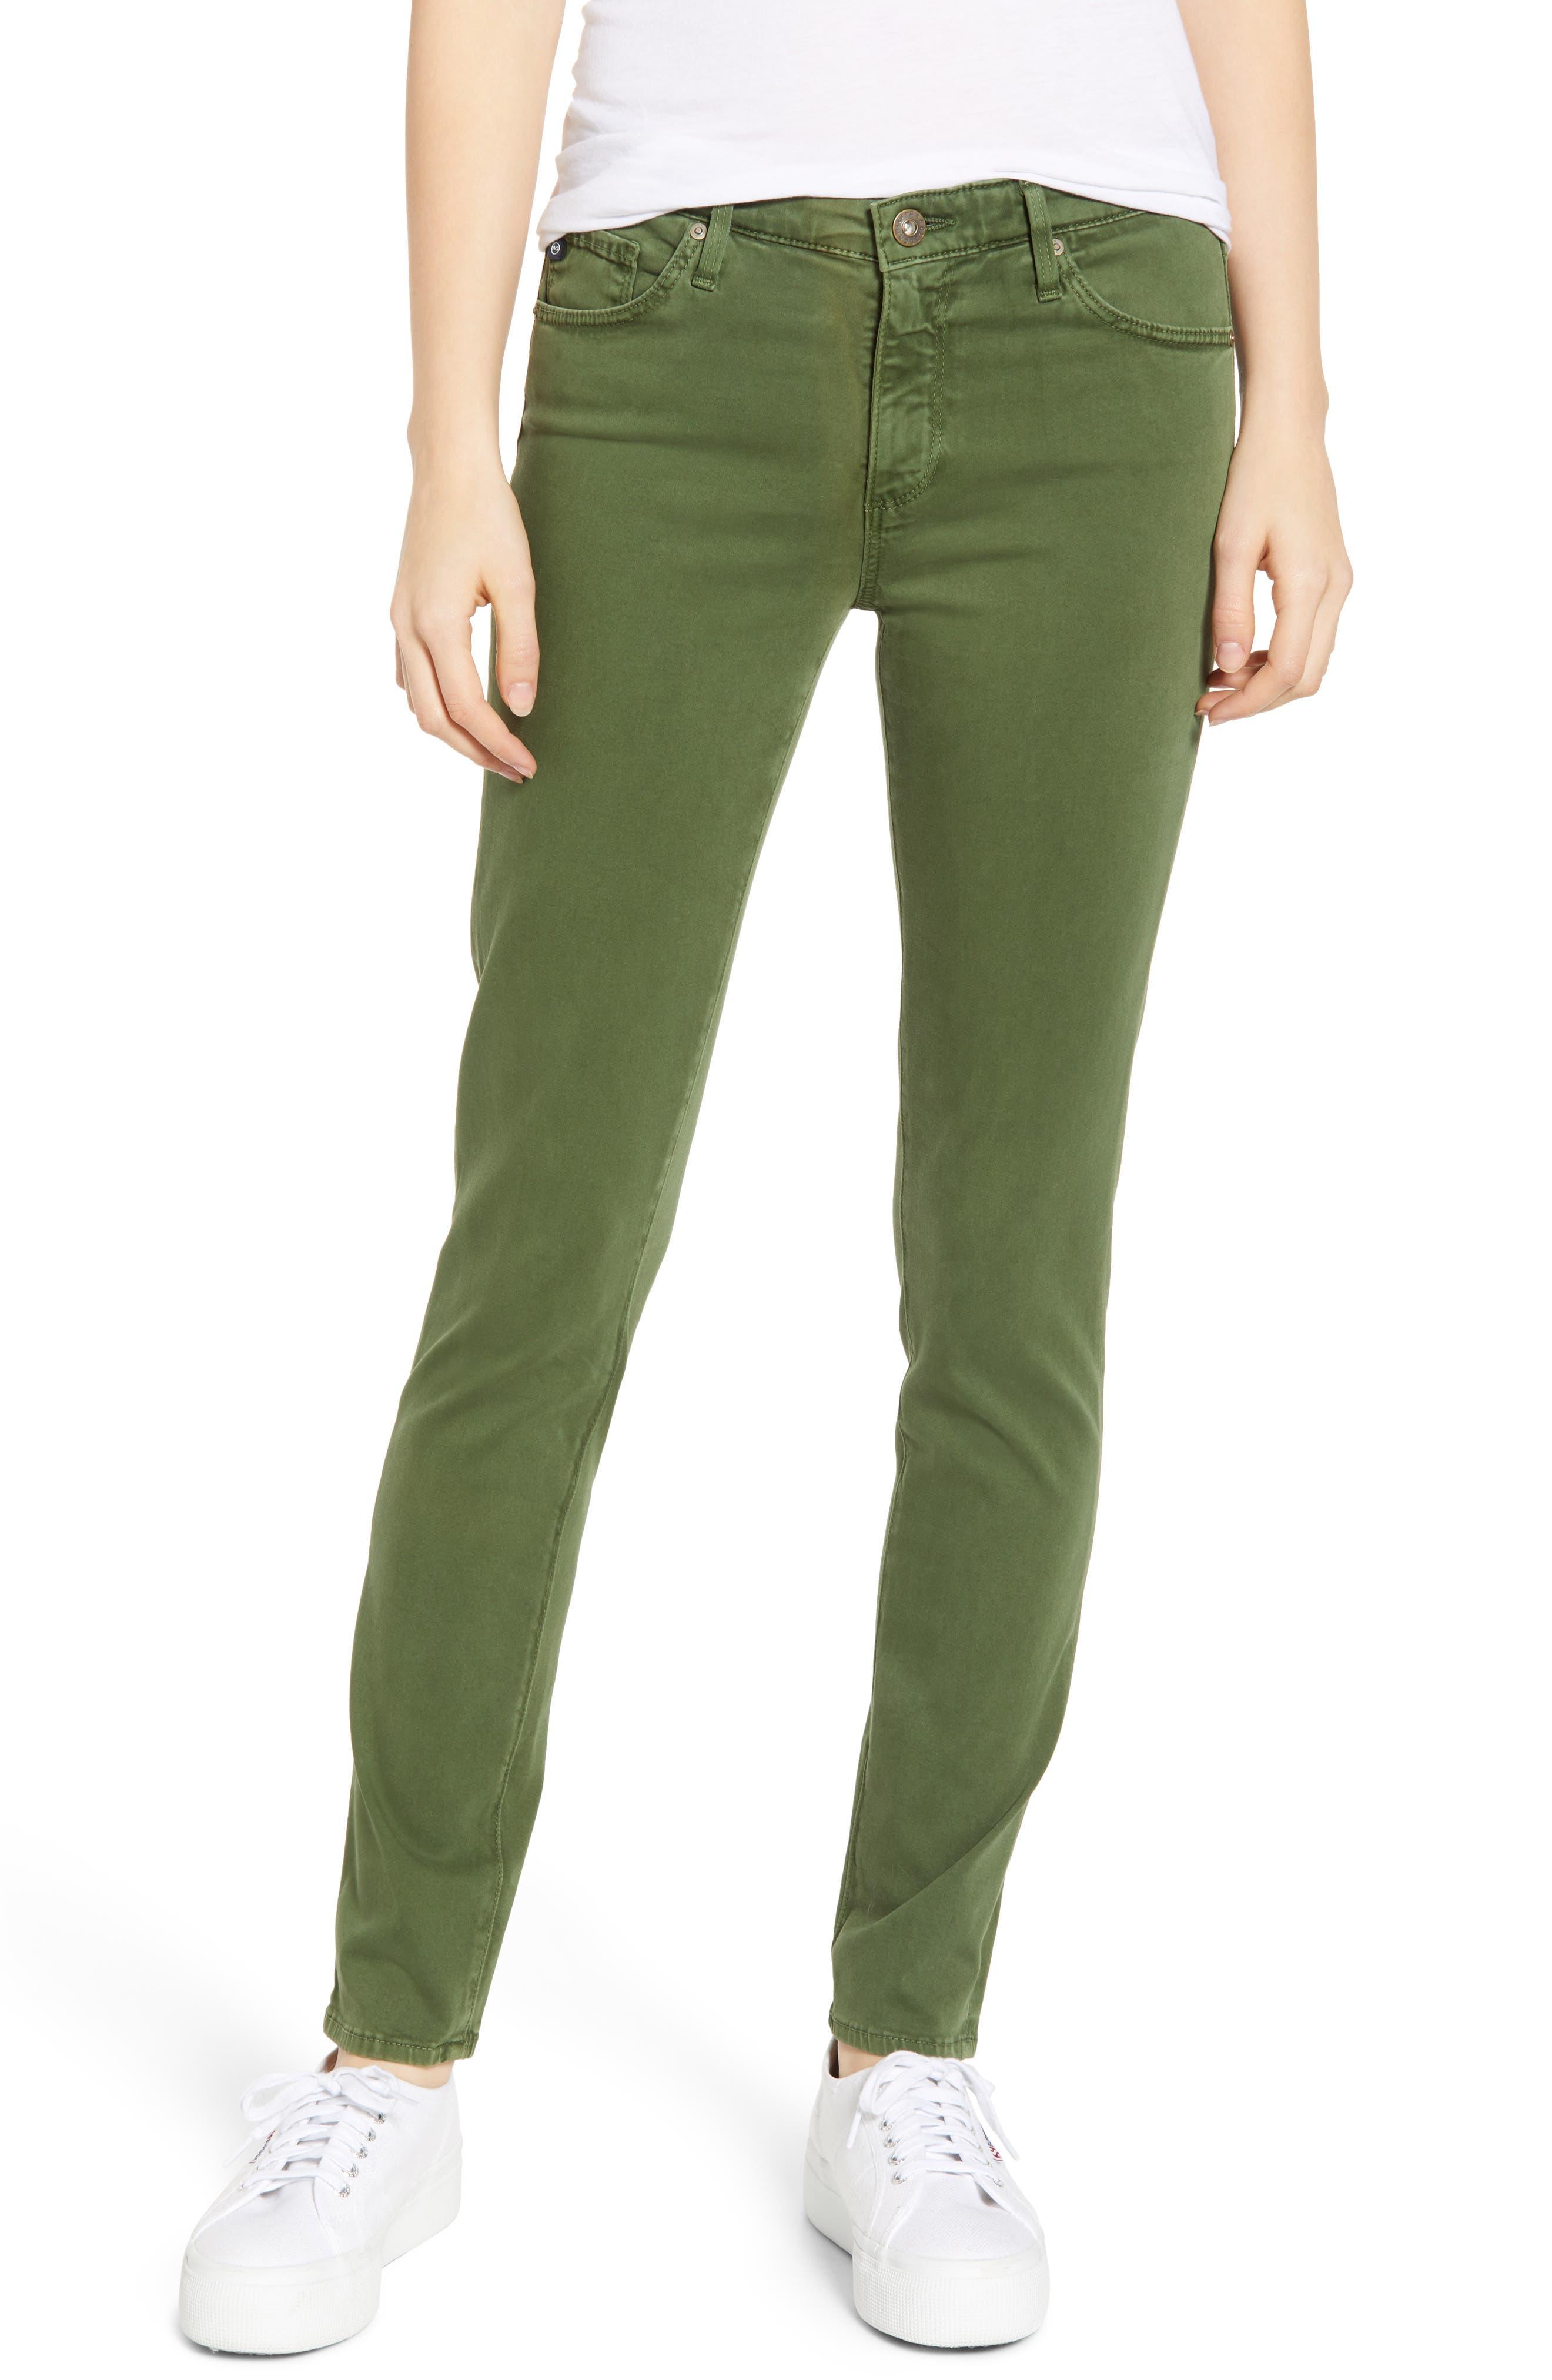 AG 'The Prima' Cigarette Leg Skinny Jeans, Main, color, SULFUR NEW SPRUCE